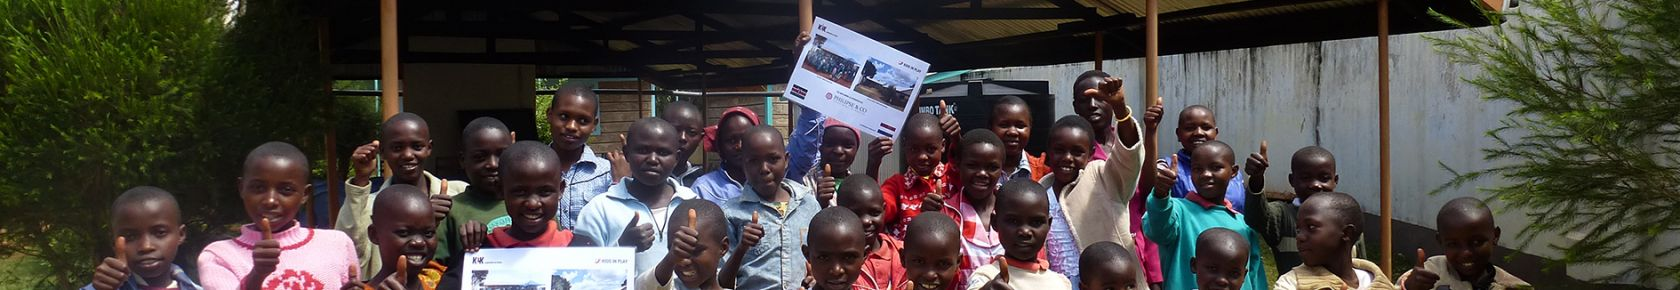 Kenia | 2013 - Philipse & Co | Vermogensbeheer Amsterdam